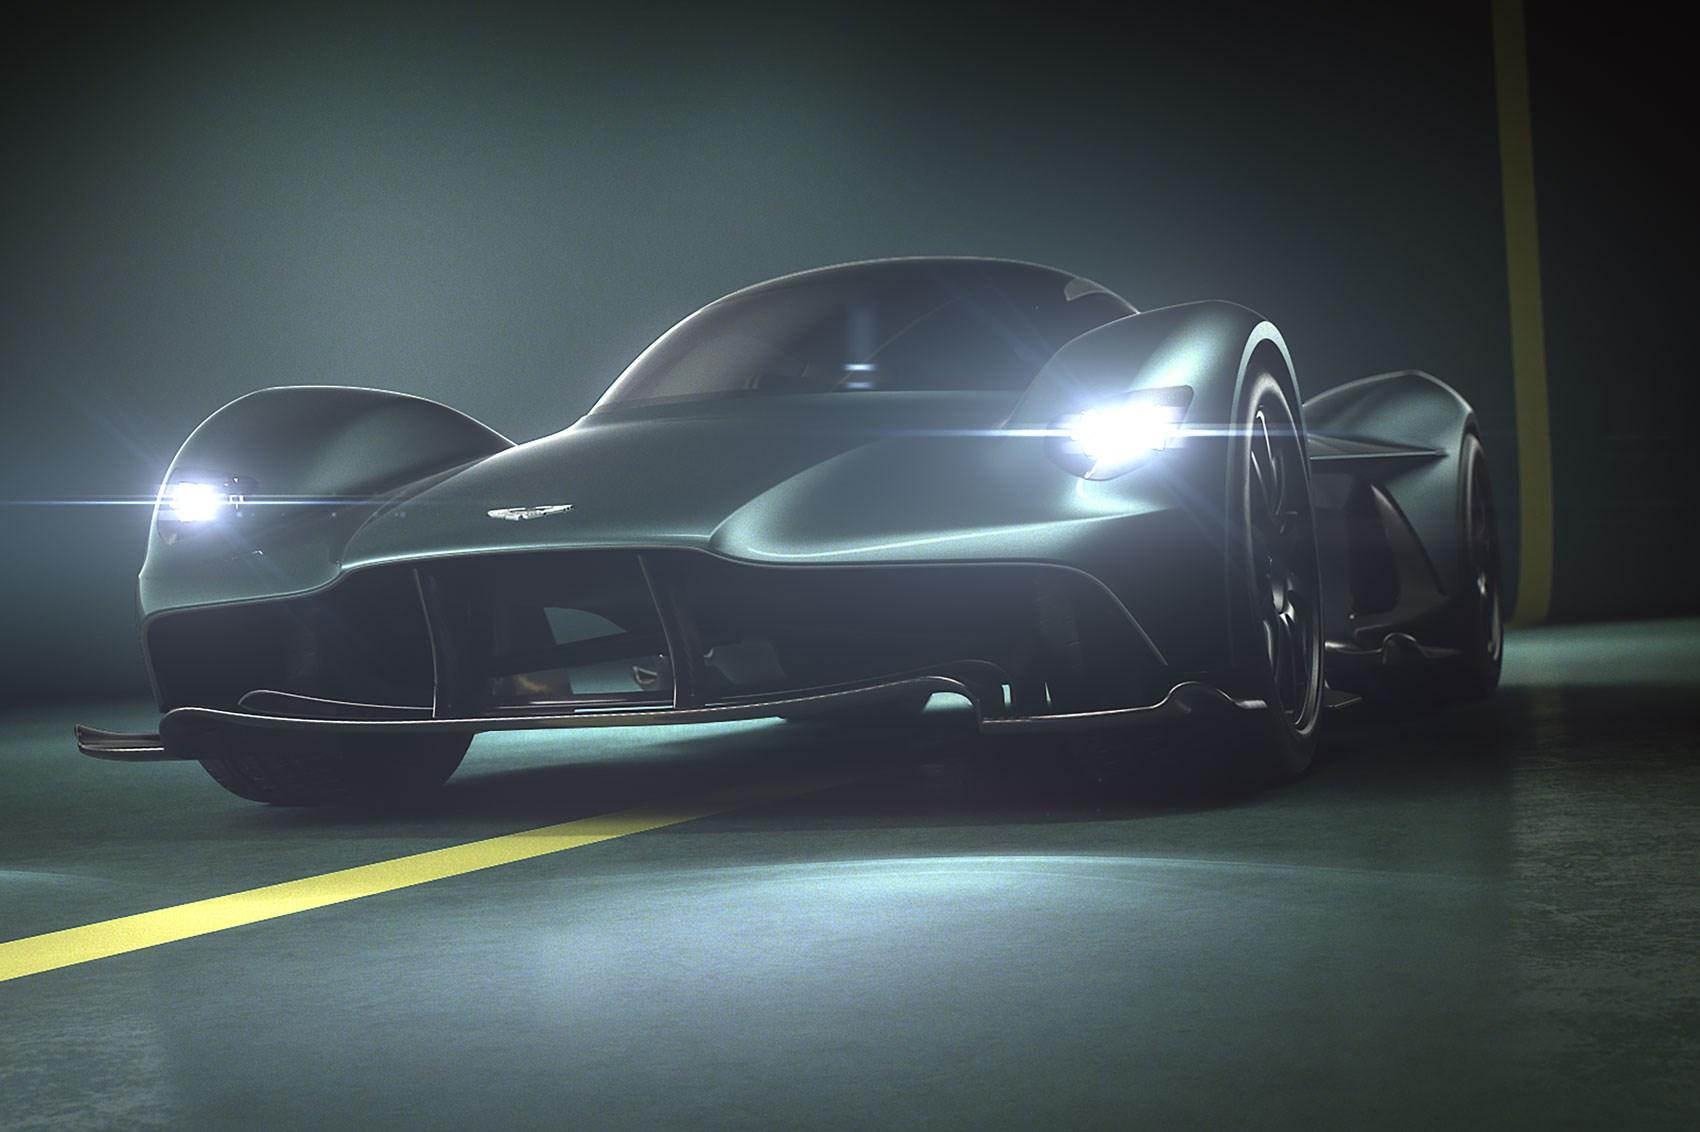 Ride Of The Valkyrie: Aston Martin Reveals Hypercar's